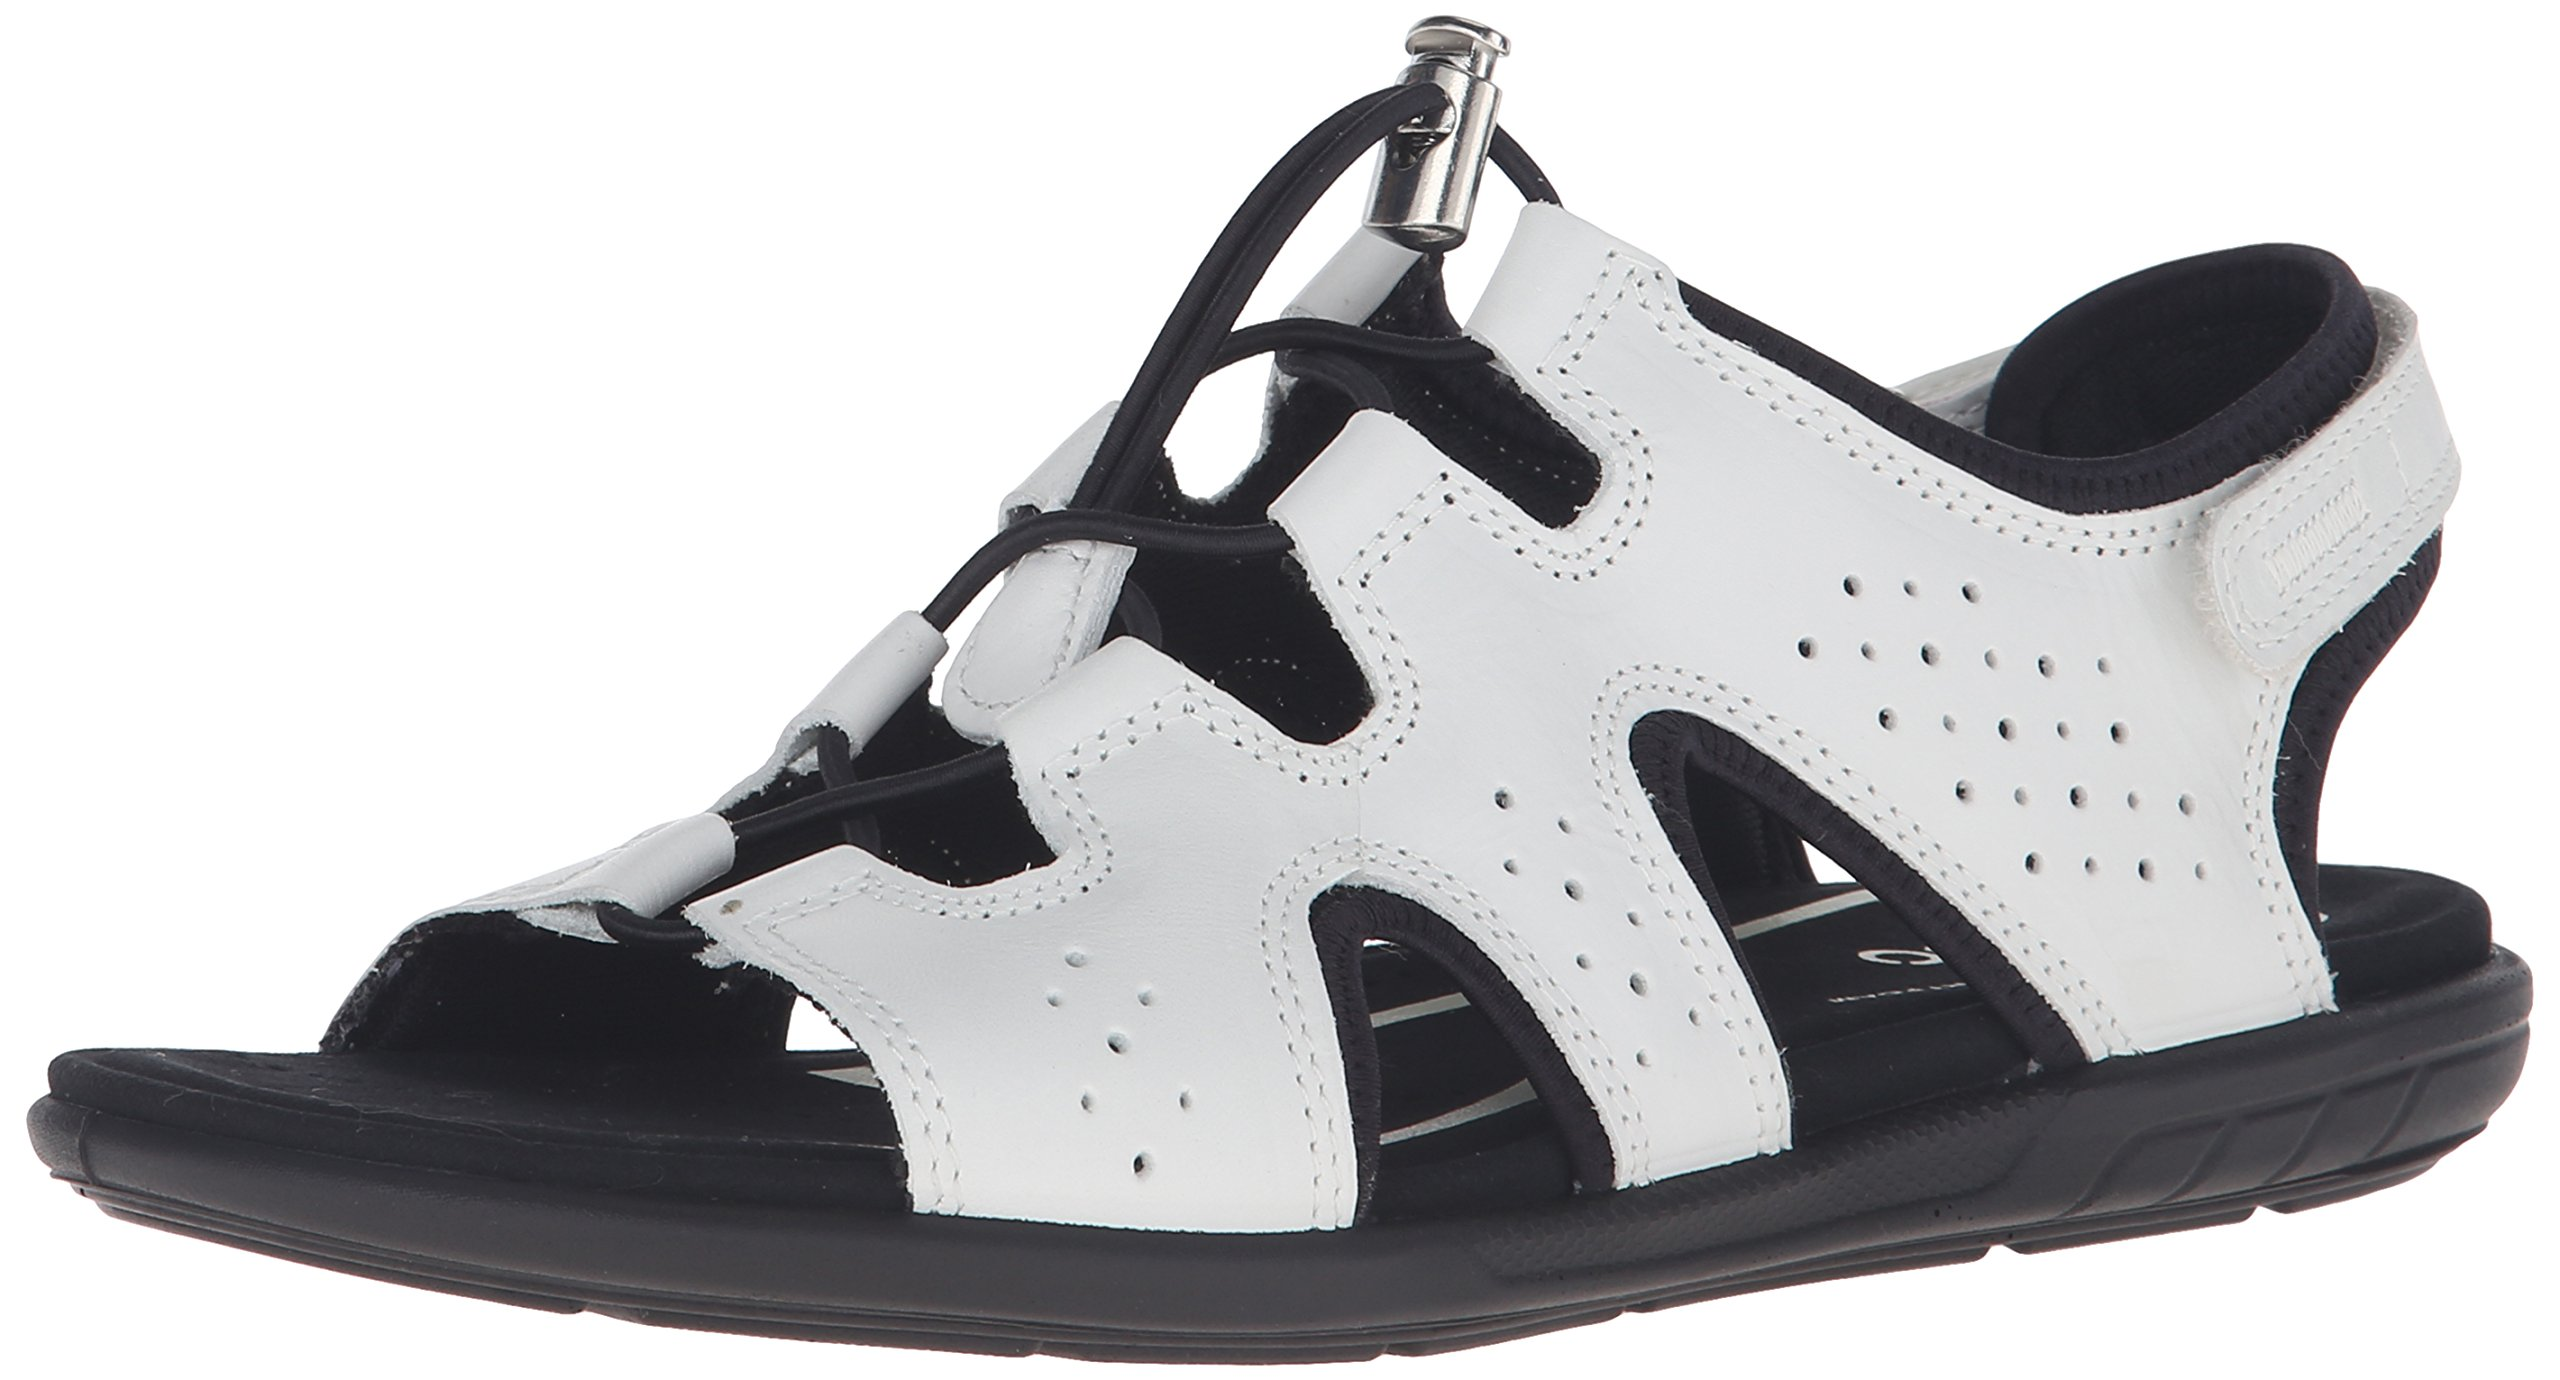 ECCO Women's Women's Bluma Toggle Gladiator Sandal, White, 40 EU/9-9.5 M US